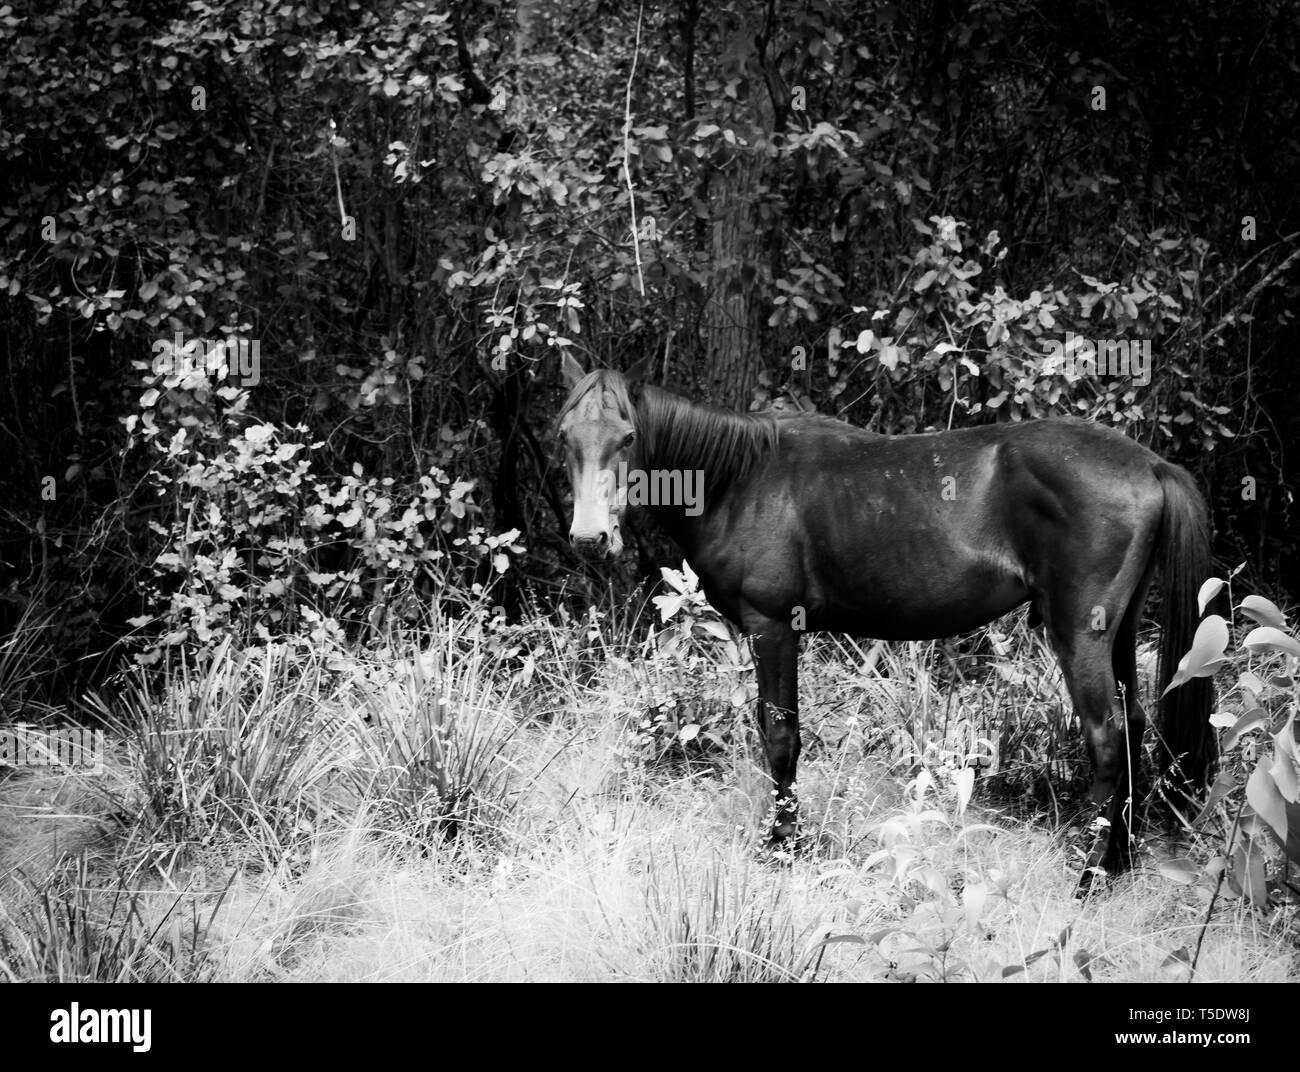 Wild horse brumby on mountain feeding on grass - Stock Image